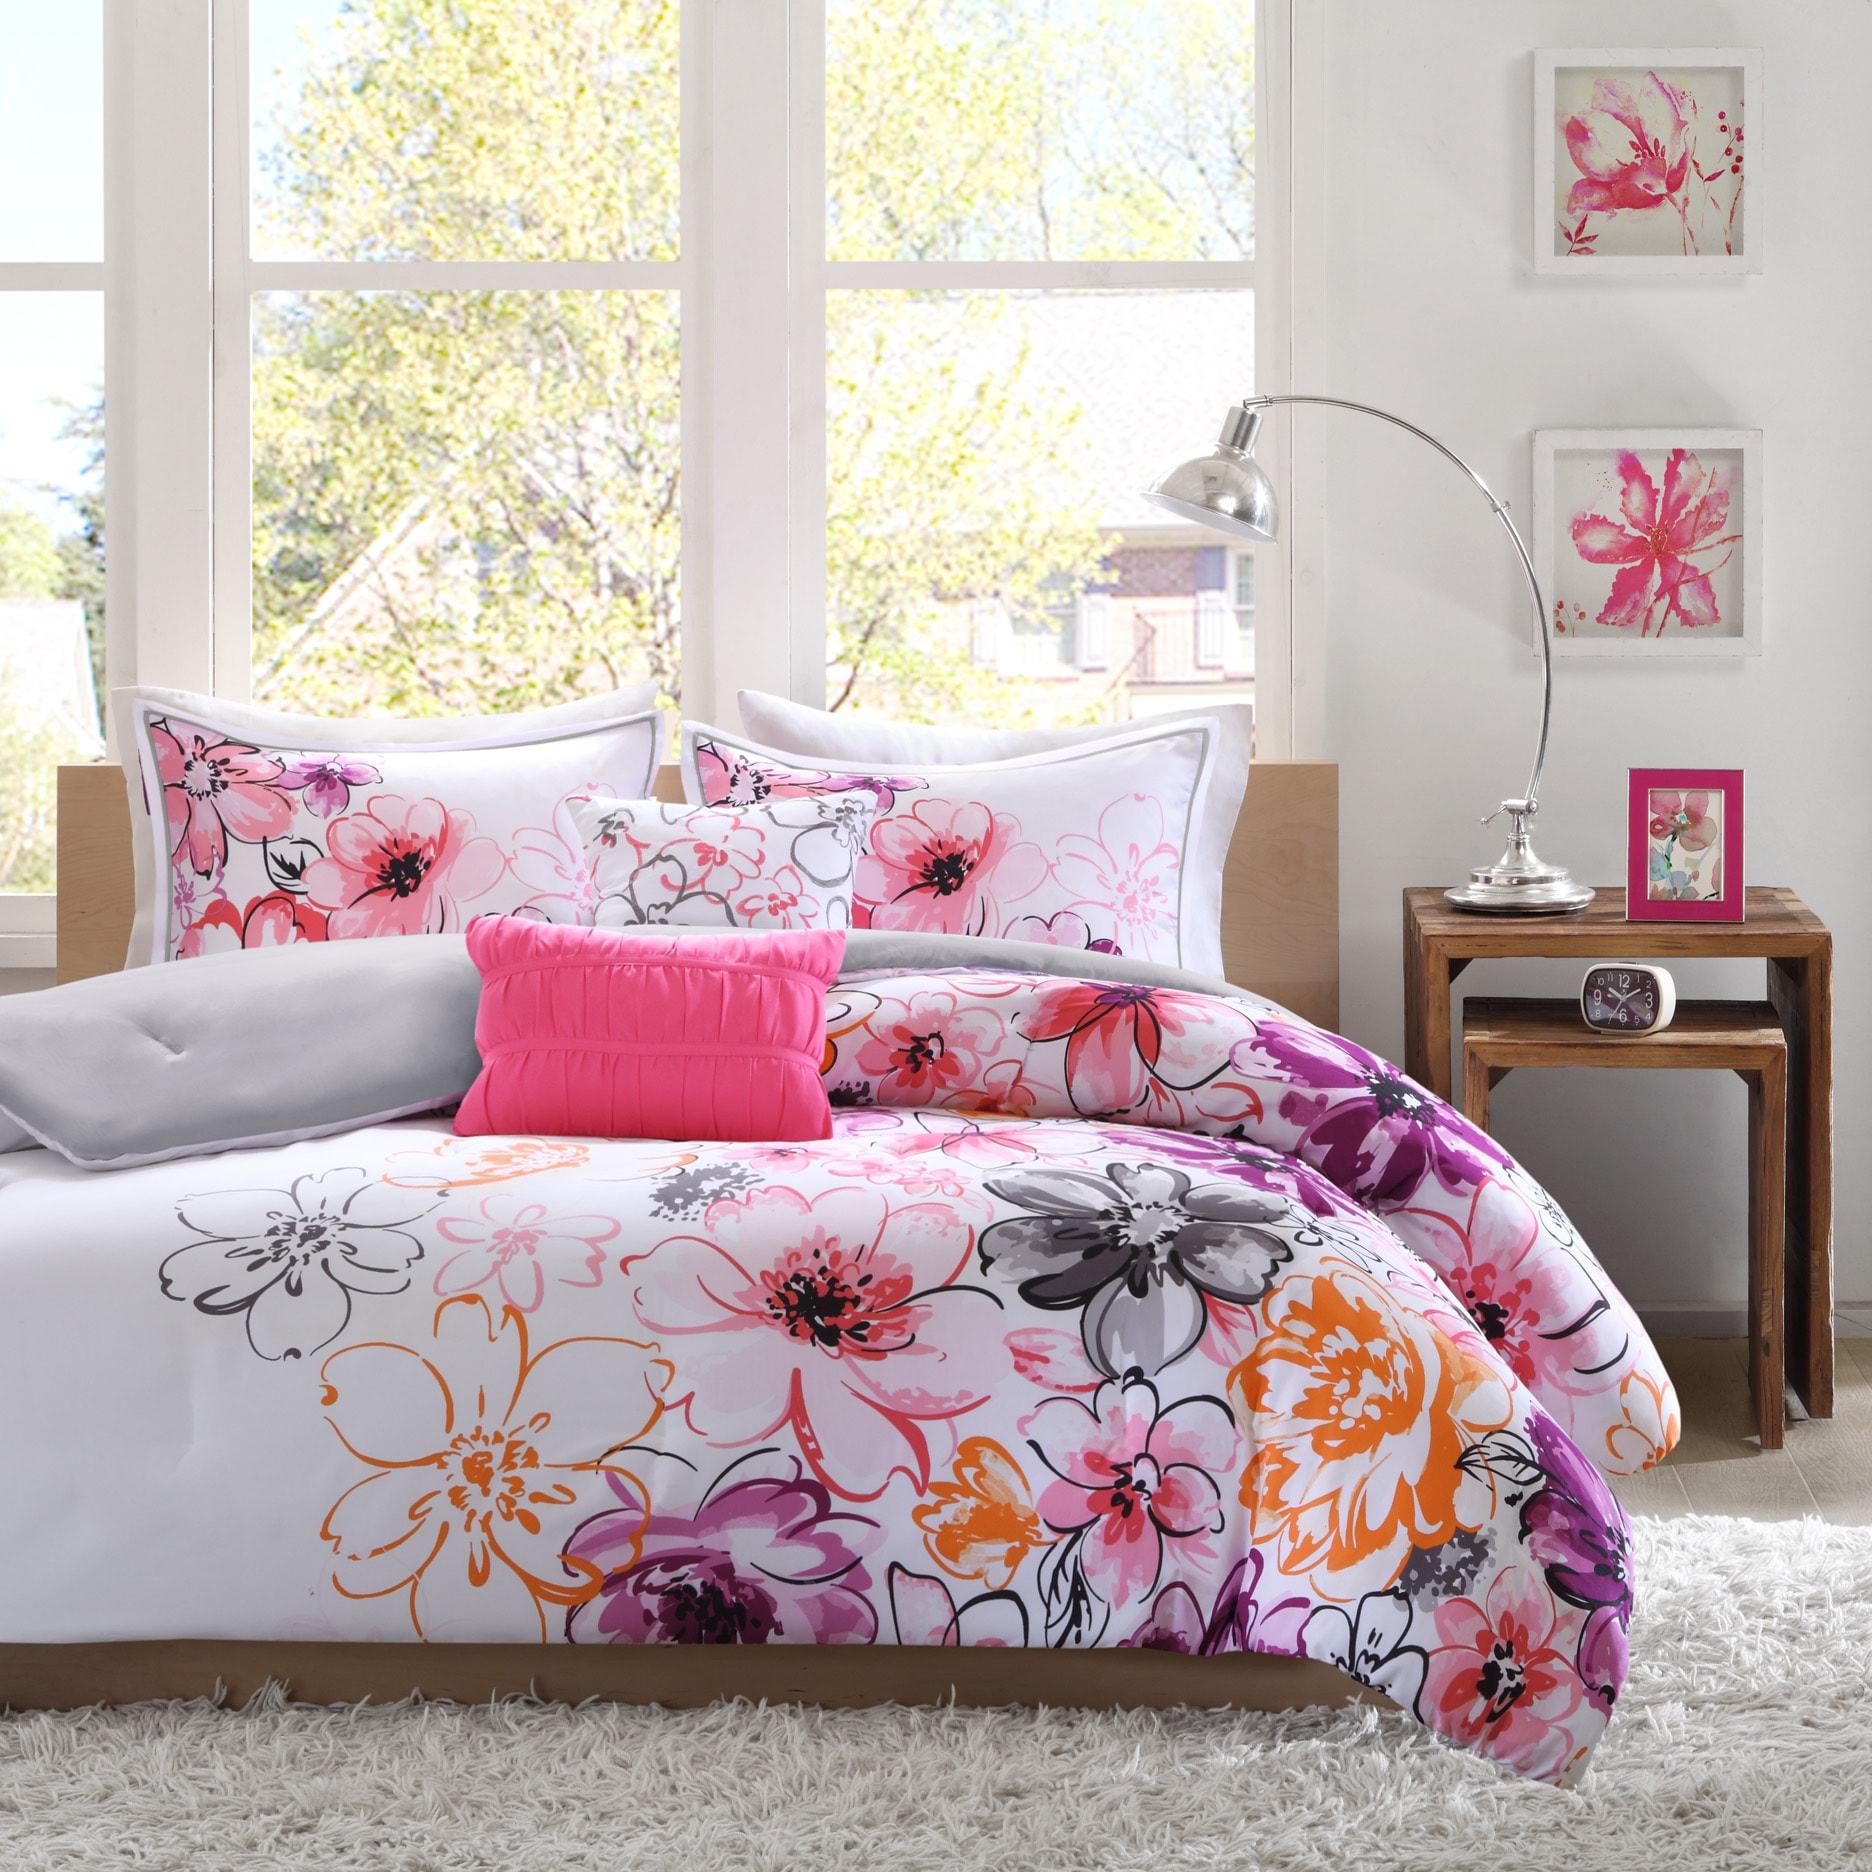 comforter world floral buy collection bedding market comforters corinne xxx